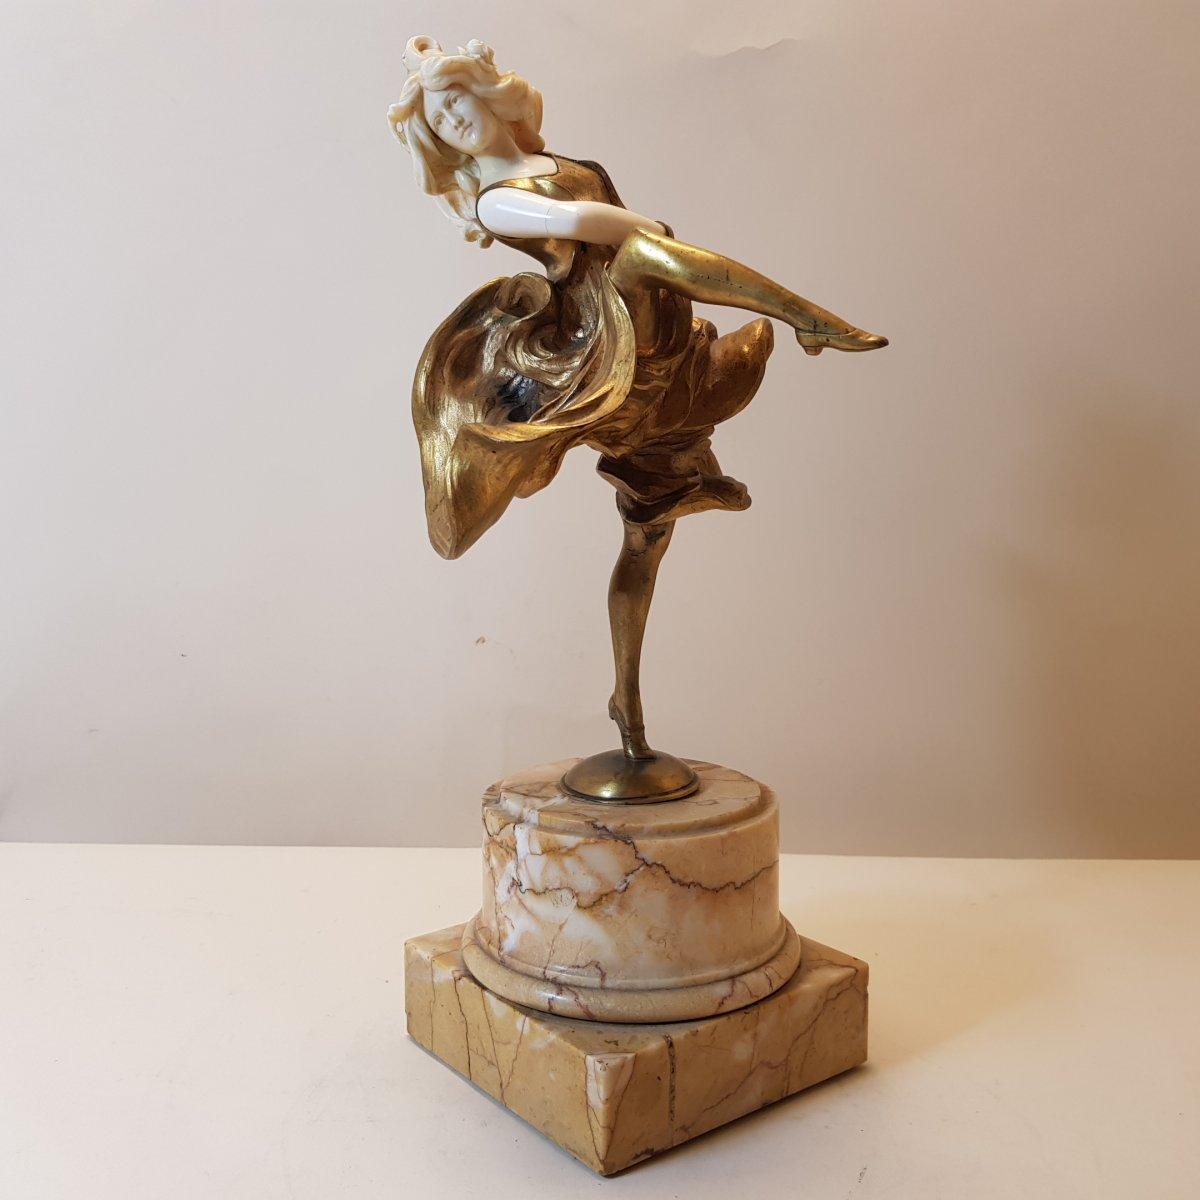 C. Kiemlen: Bronze And Ivory Sculpture